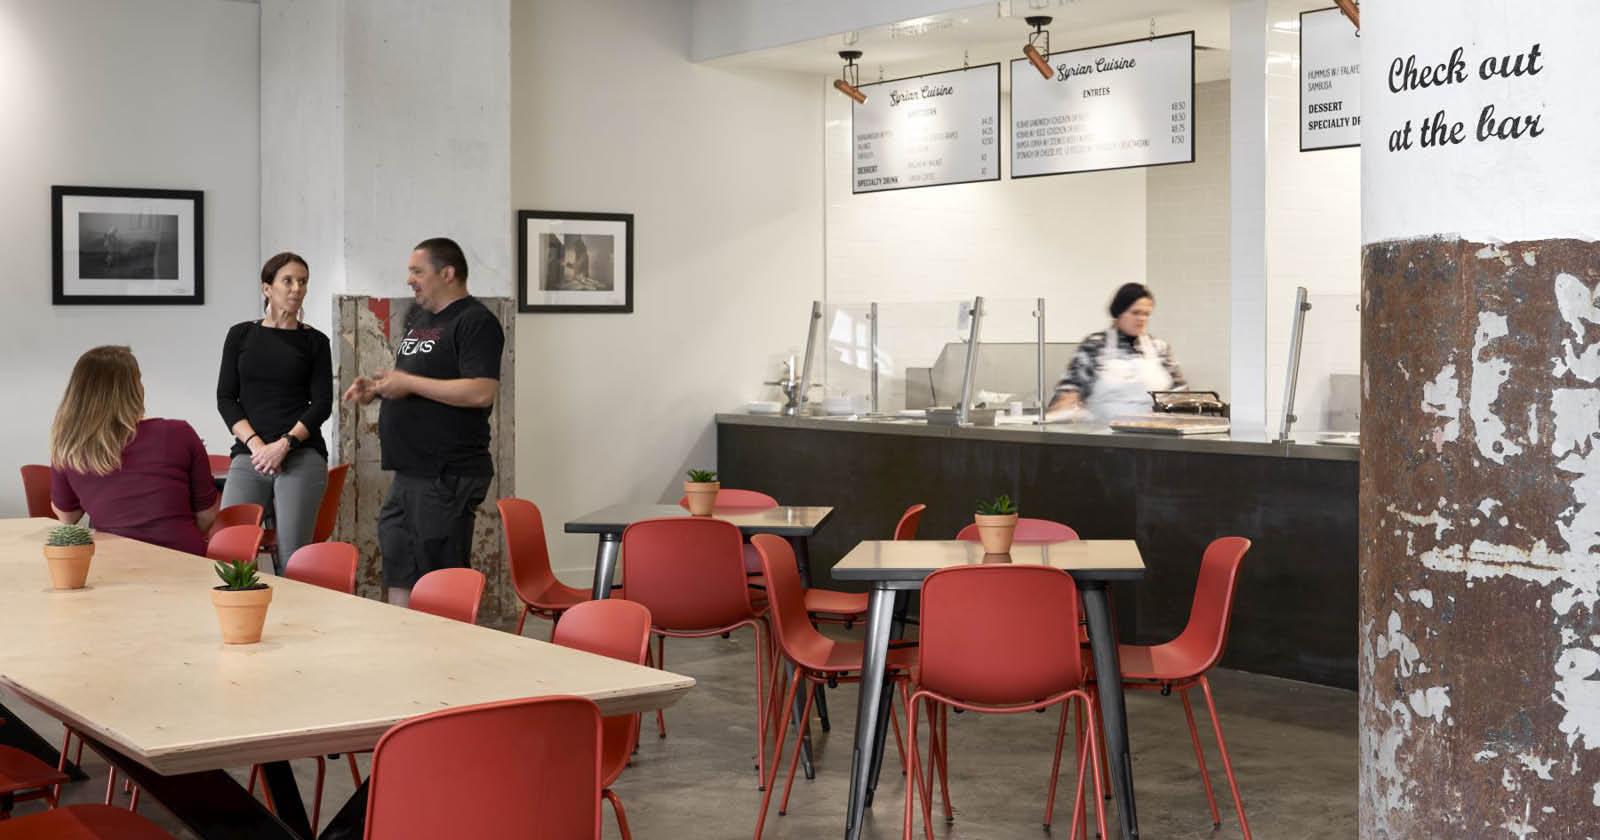 Global Café, Memphis, TN